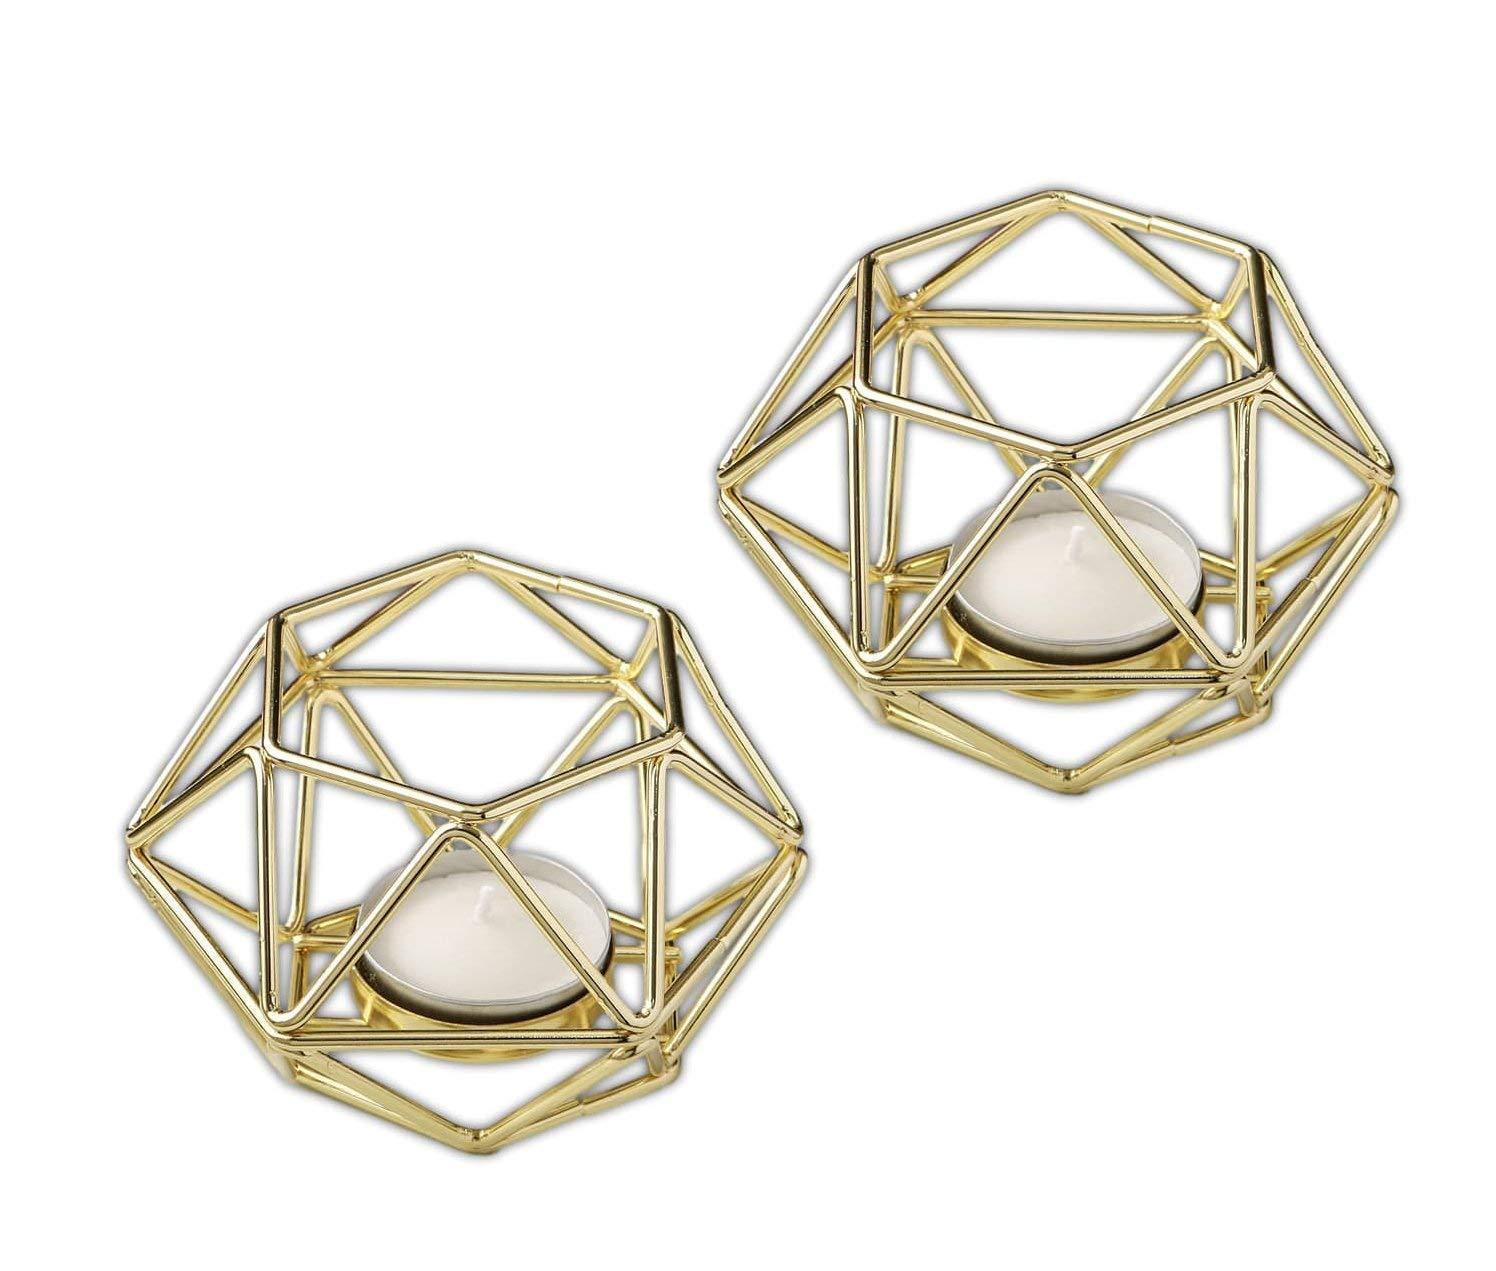 13 Fashioncraft 4'' x 2 1/2'' Metal Gold Hexagon Shaped Geometric Design Tea Light Votive Candle Holder Wedding Bridal Shower Anniversary Favors